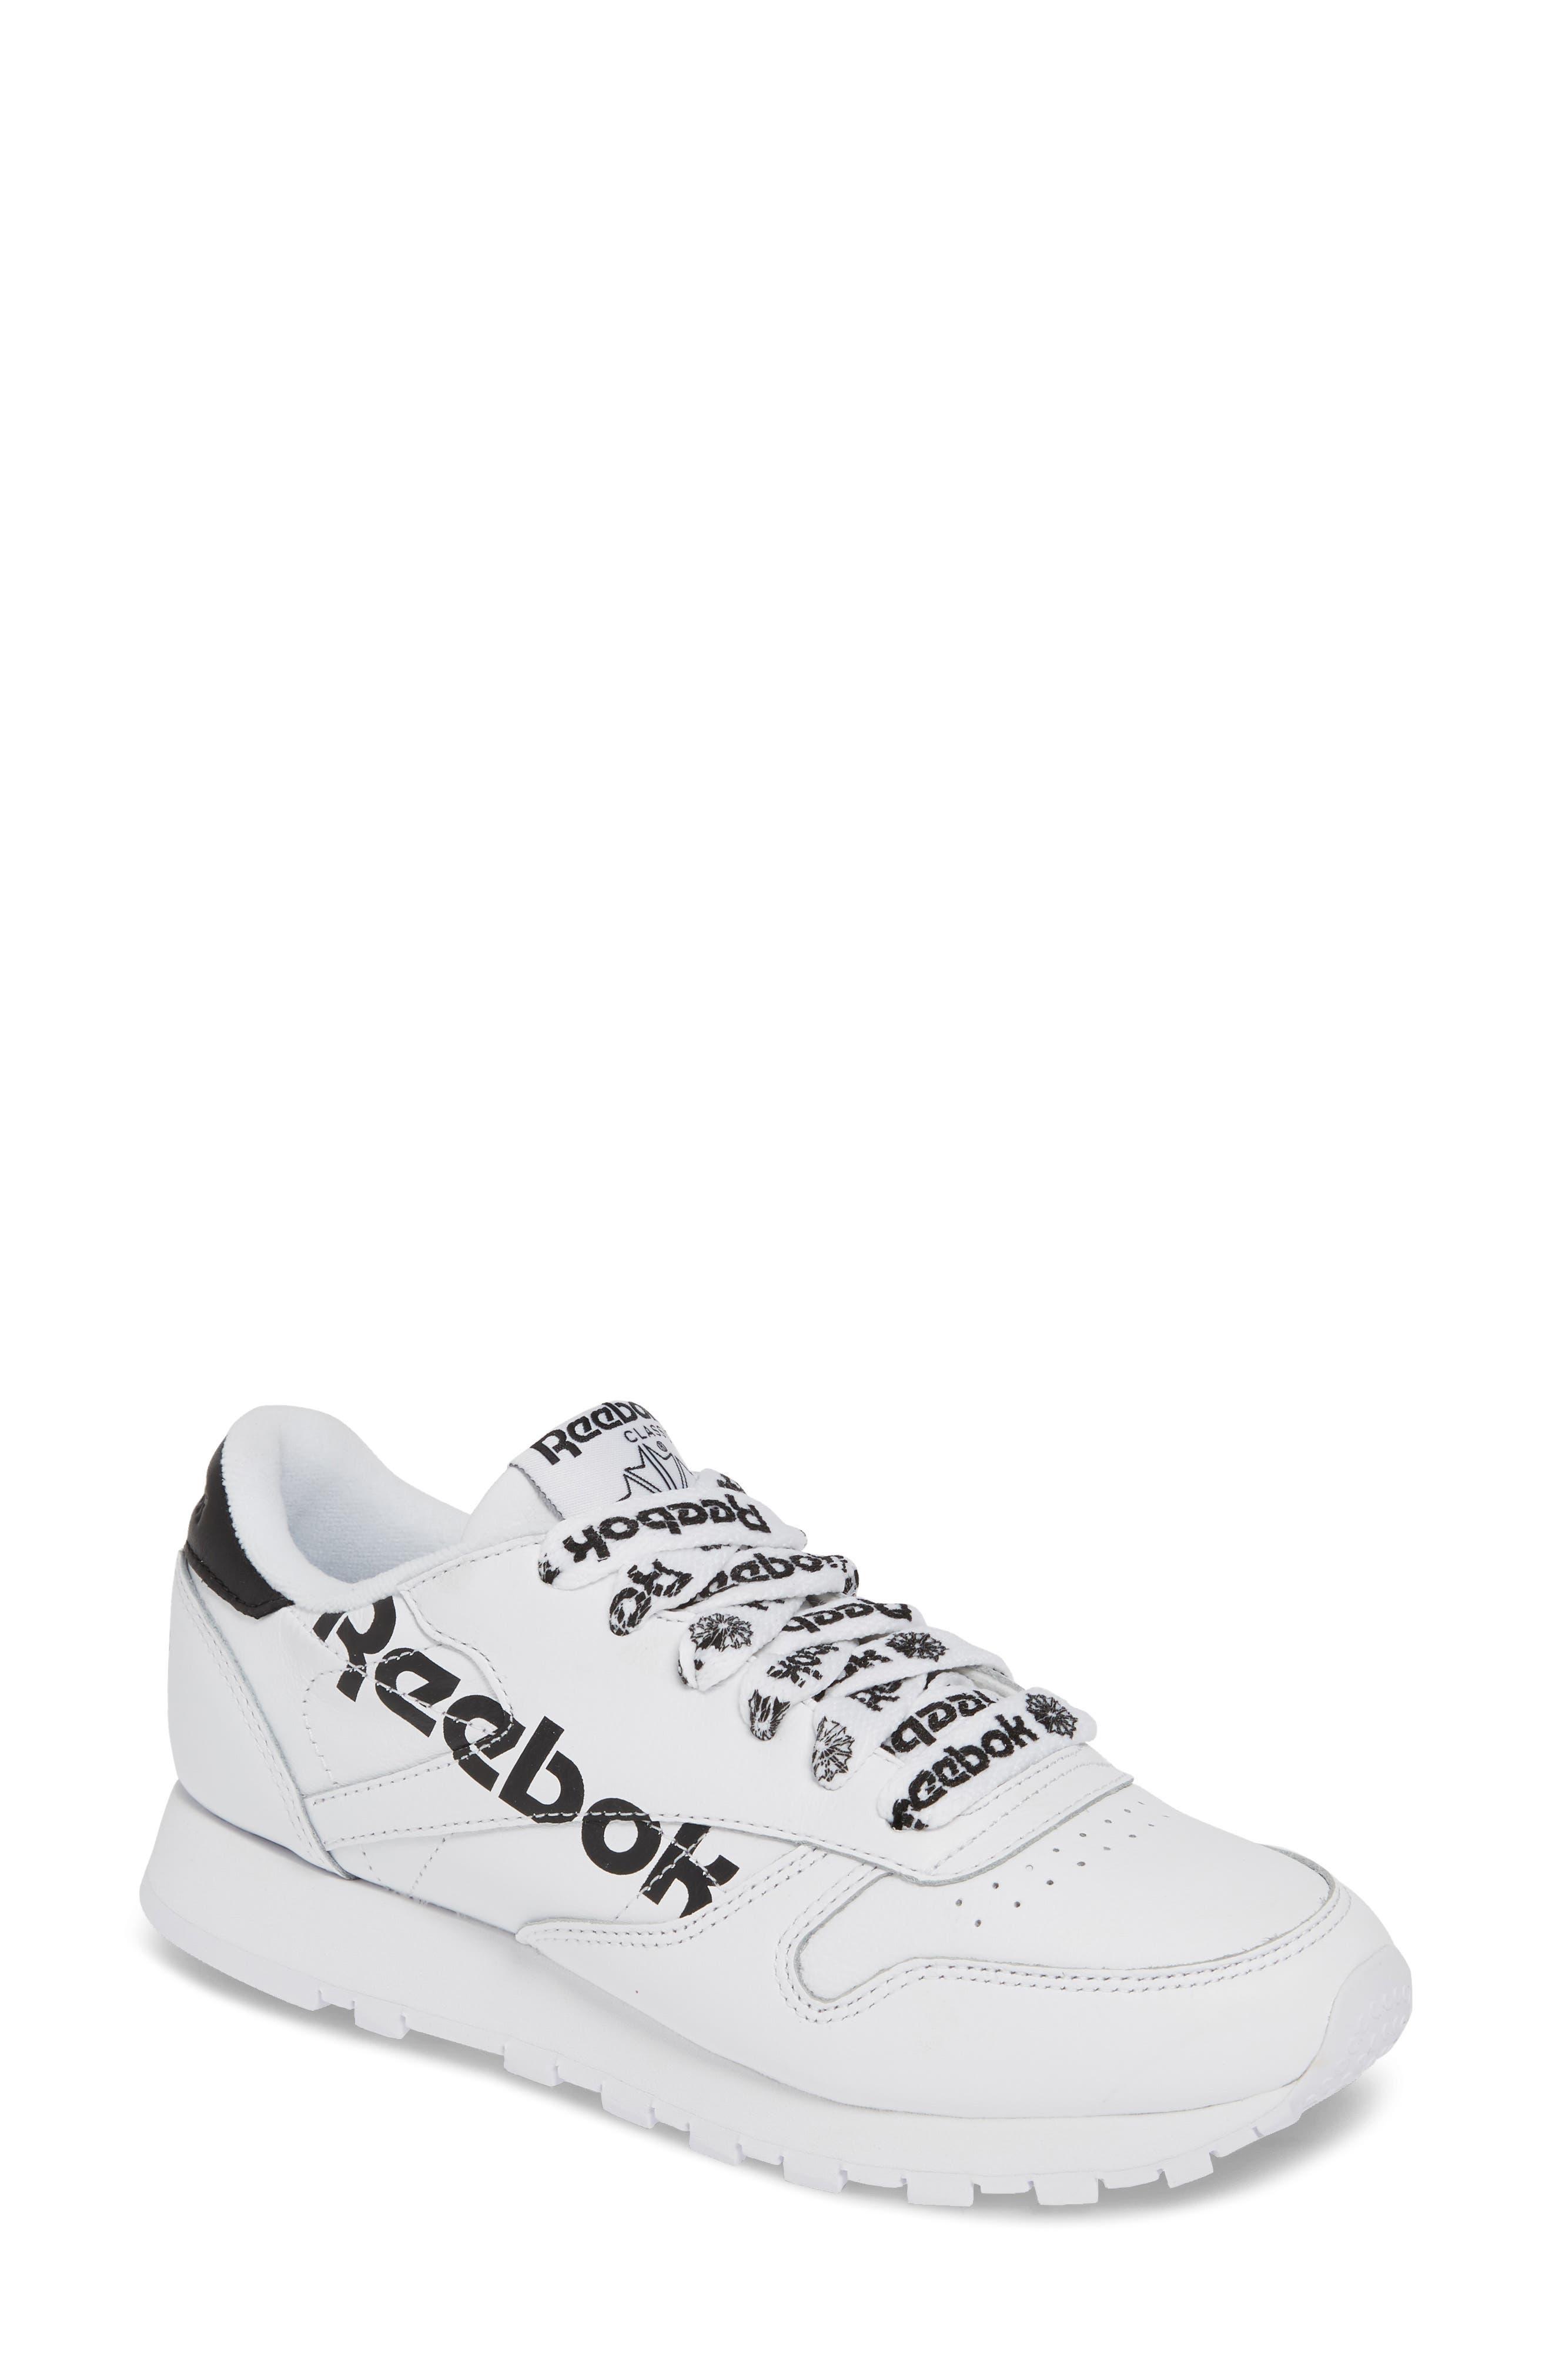 a88ad7cfbfb Reebok Women s Shoes